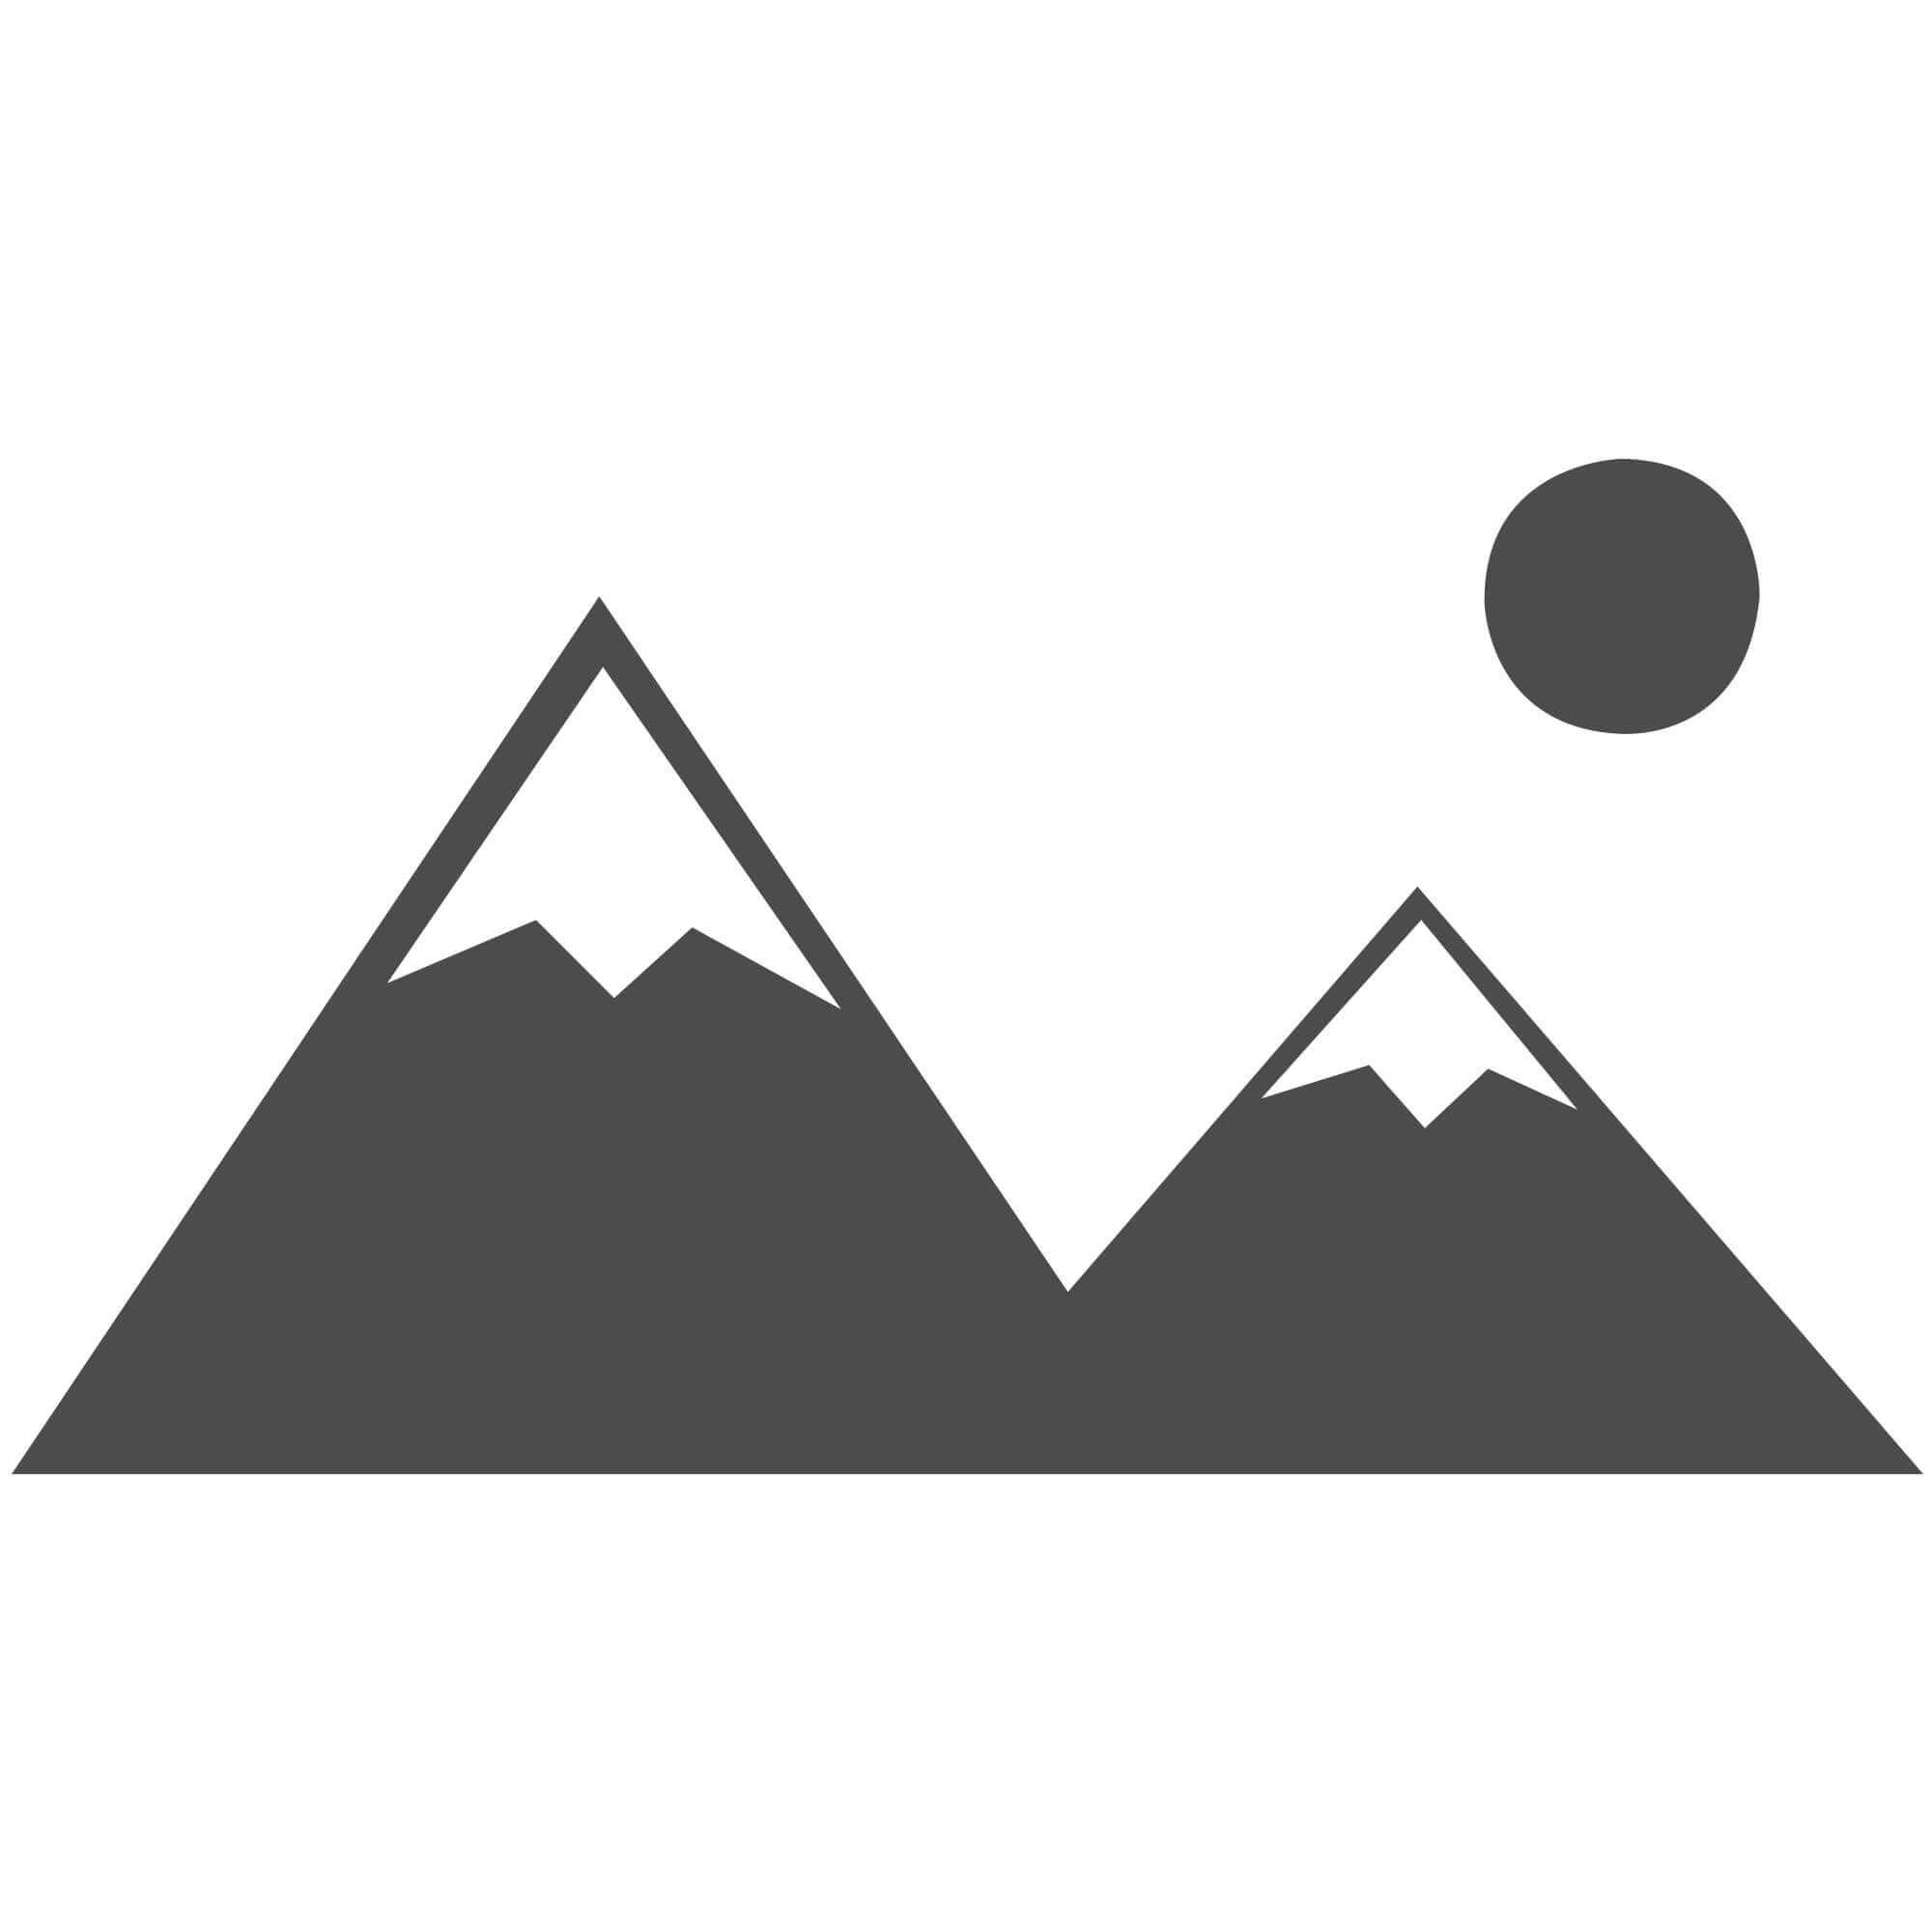 "Pearl Shaggy Rust Rug - Size 160 x 230 cm (5'3"" x 7'7"")"